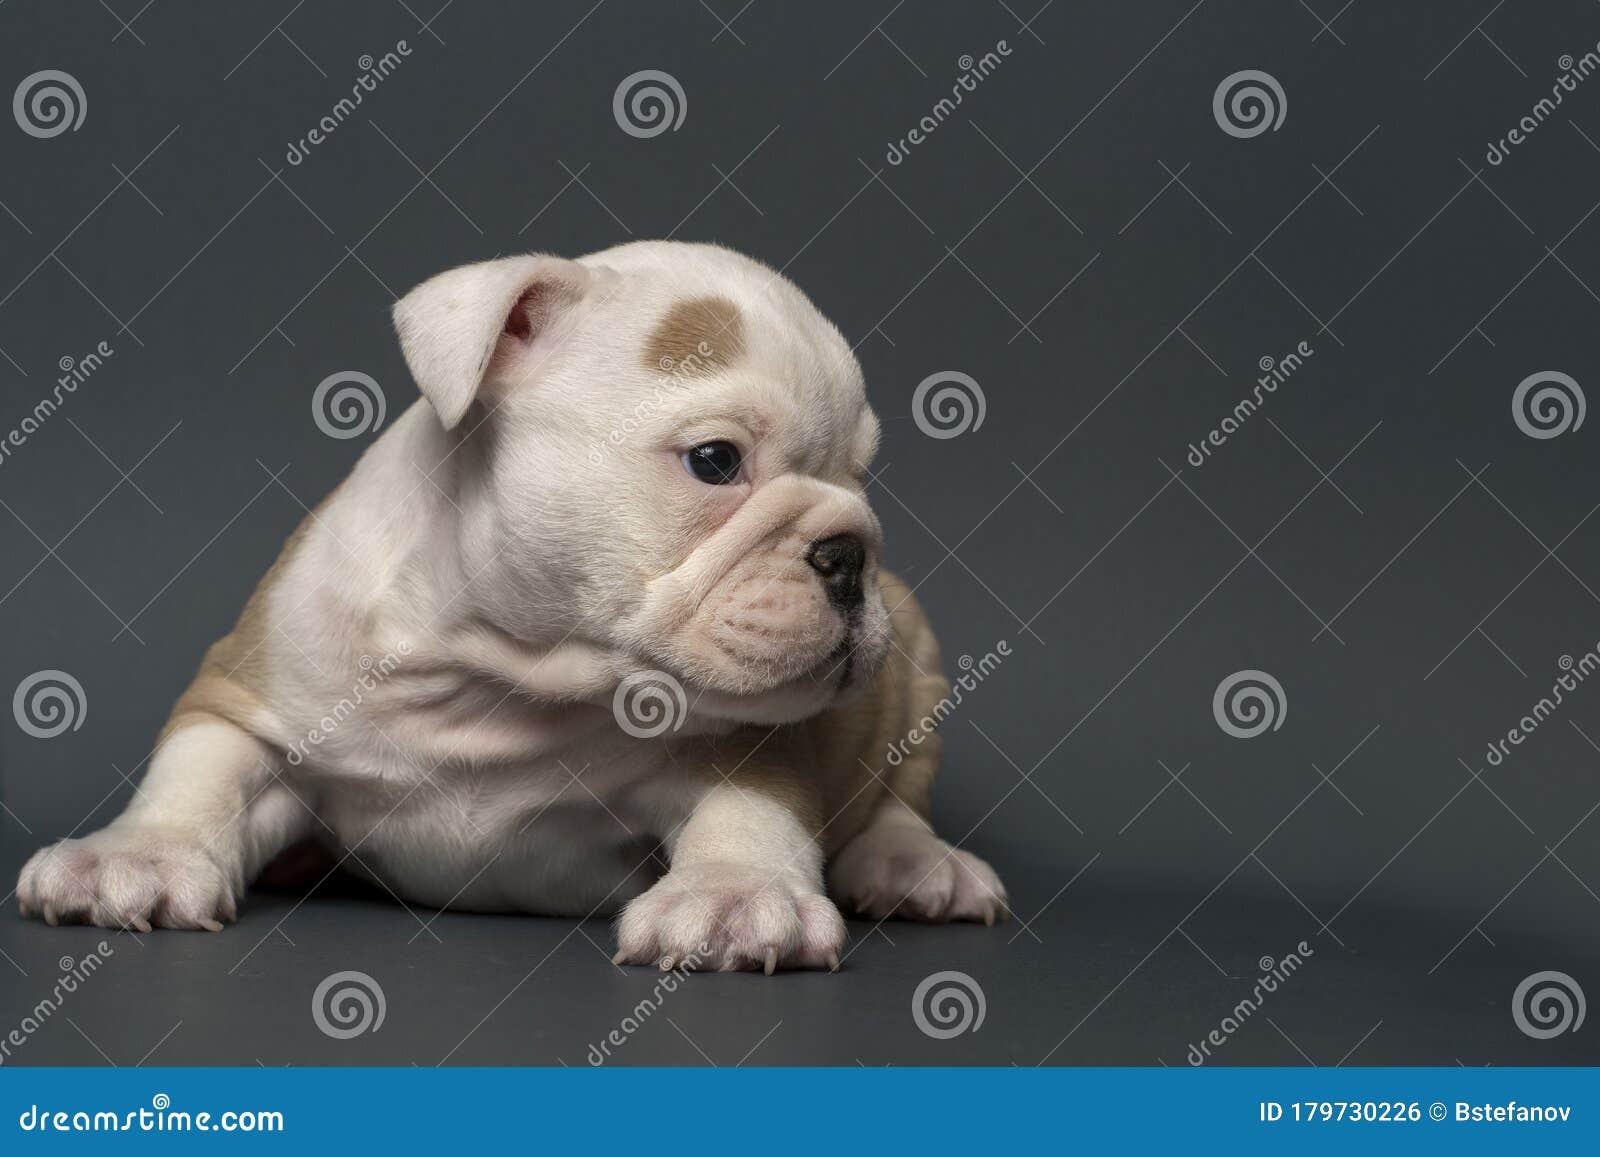 English Bulldog Puppy Stock Photo Image Of Puppy Looking 179730226